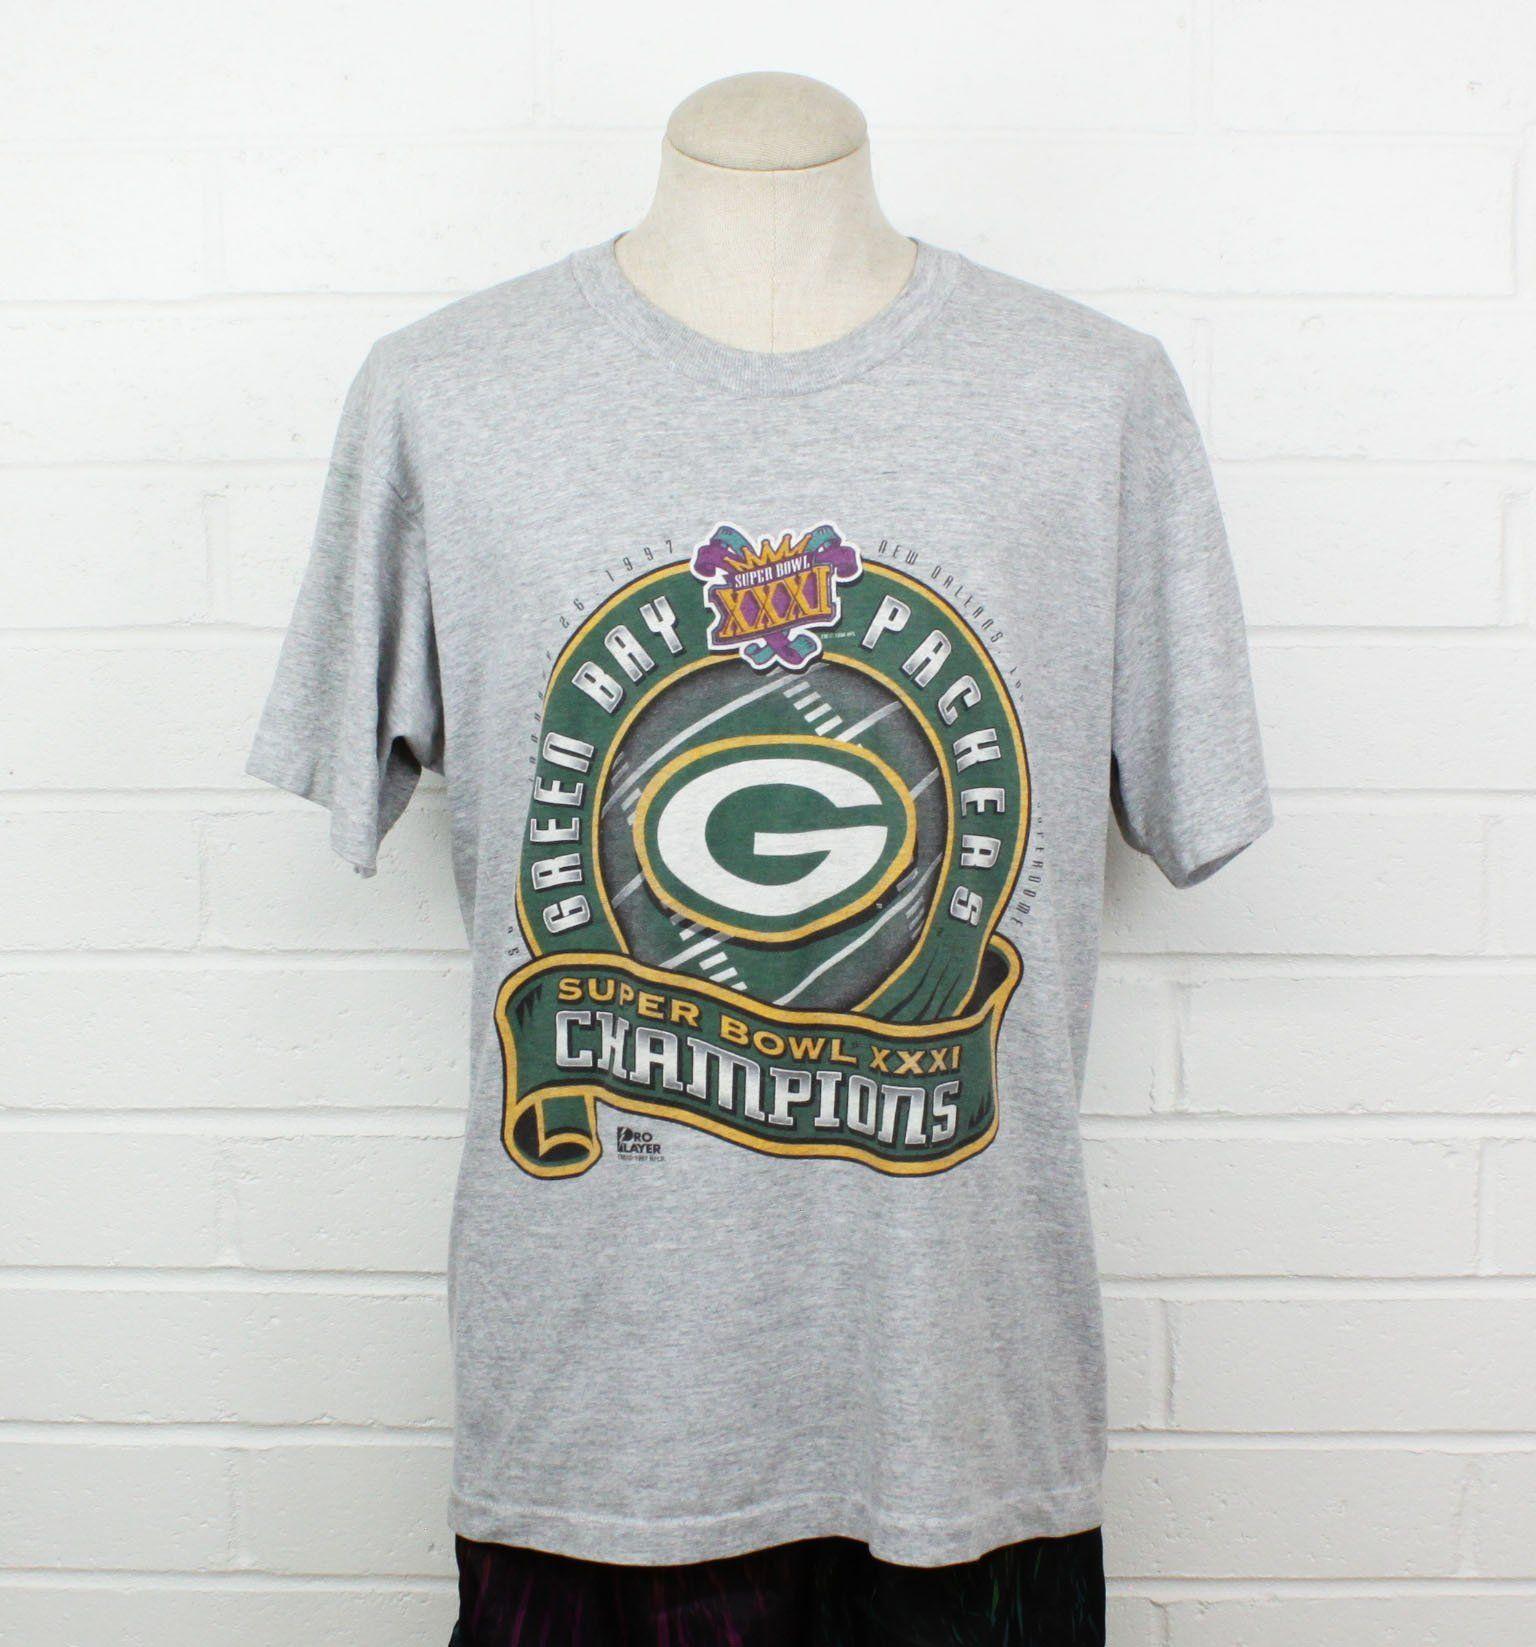 Vintage 90s Green Bay Packers Large Shirt Super Bowl Champions 1997 Gray Tee T Shirt Grey Tee Shirts Heavy Jacket